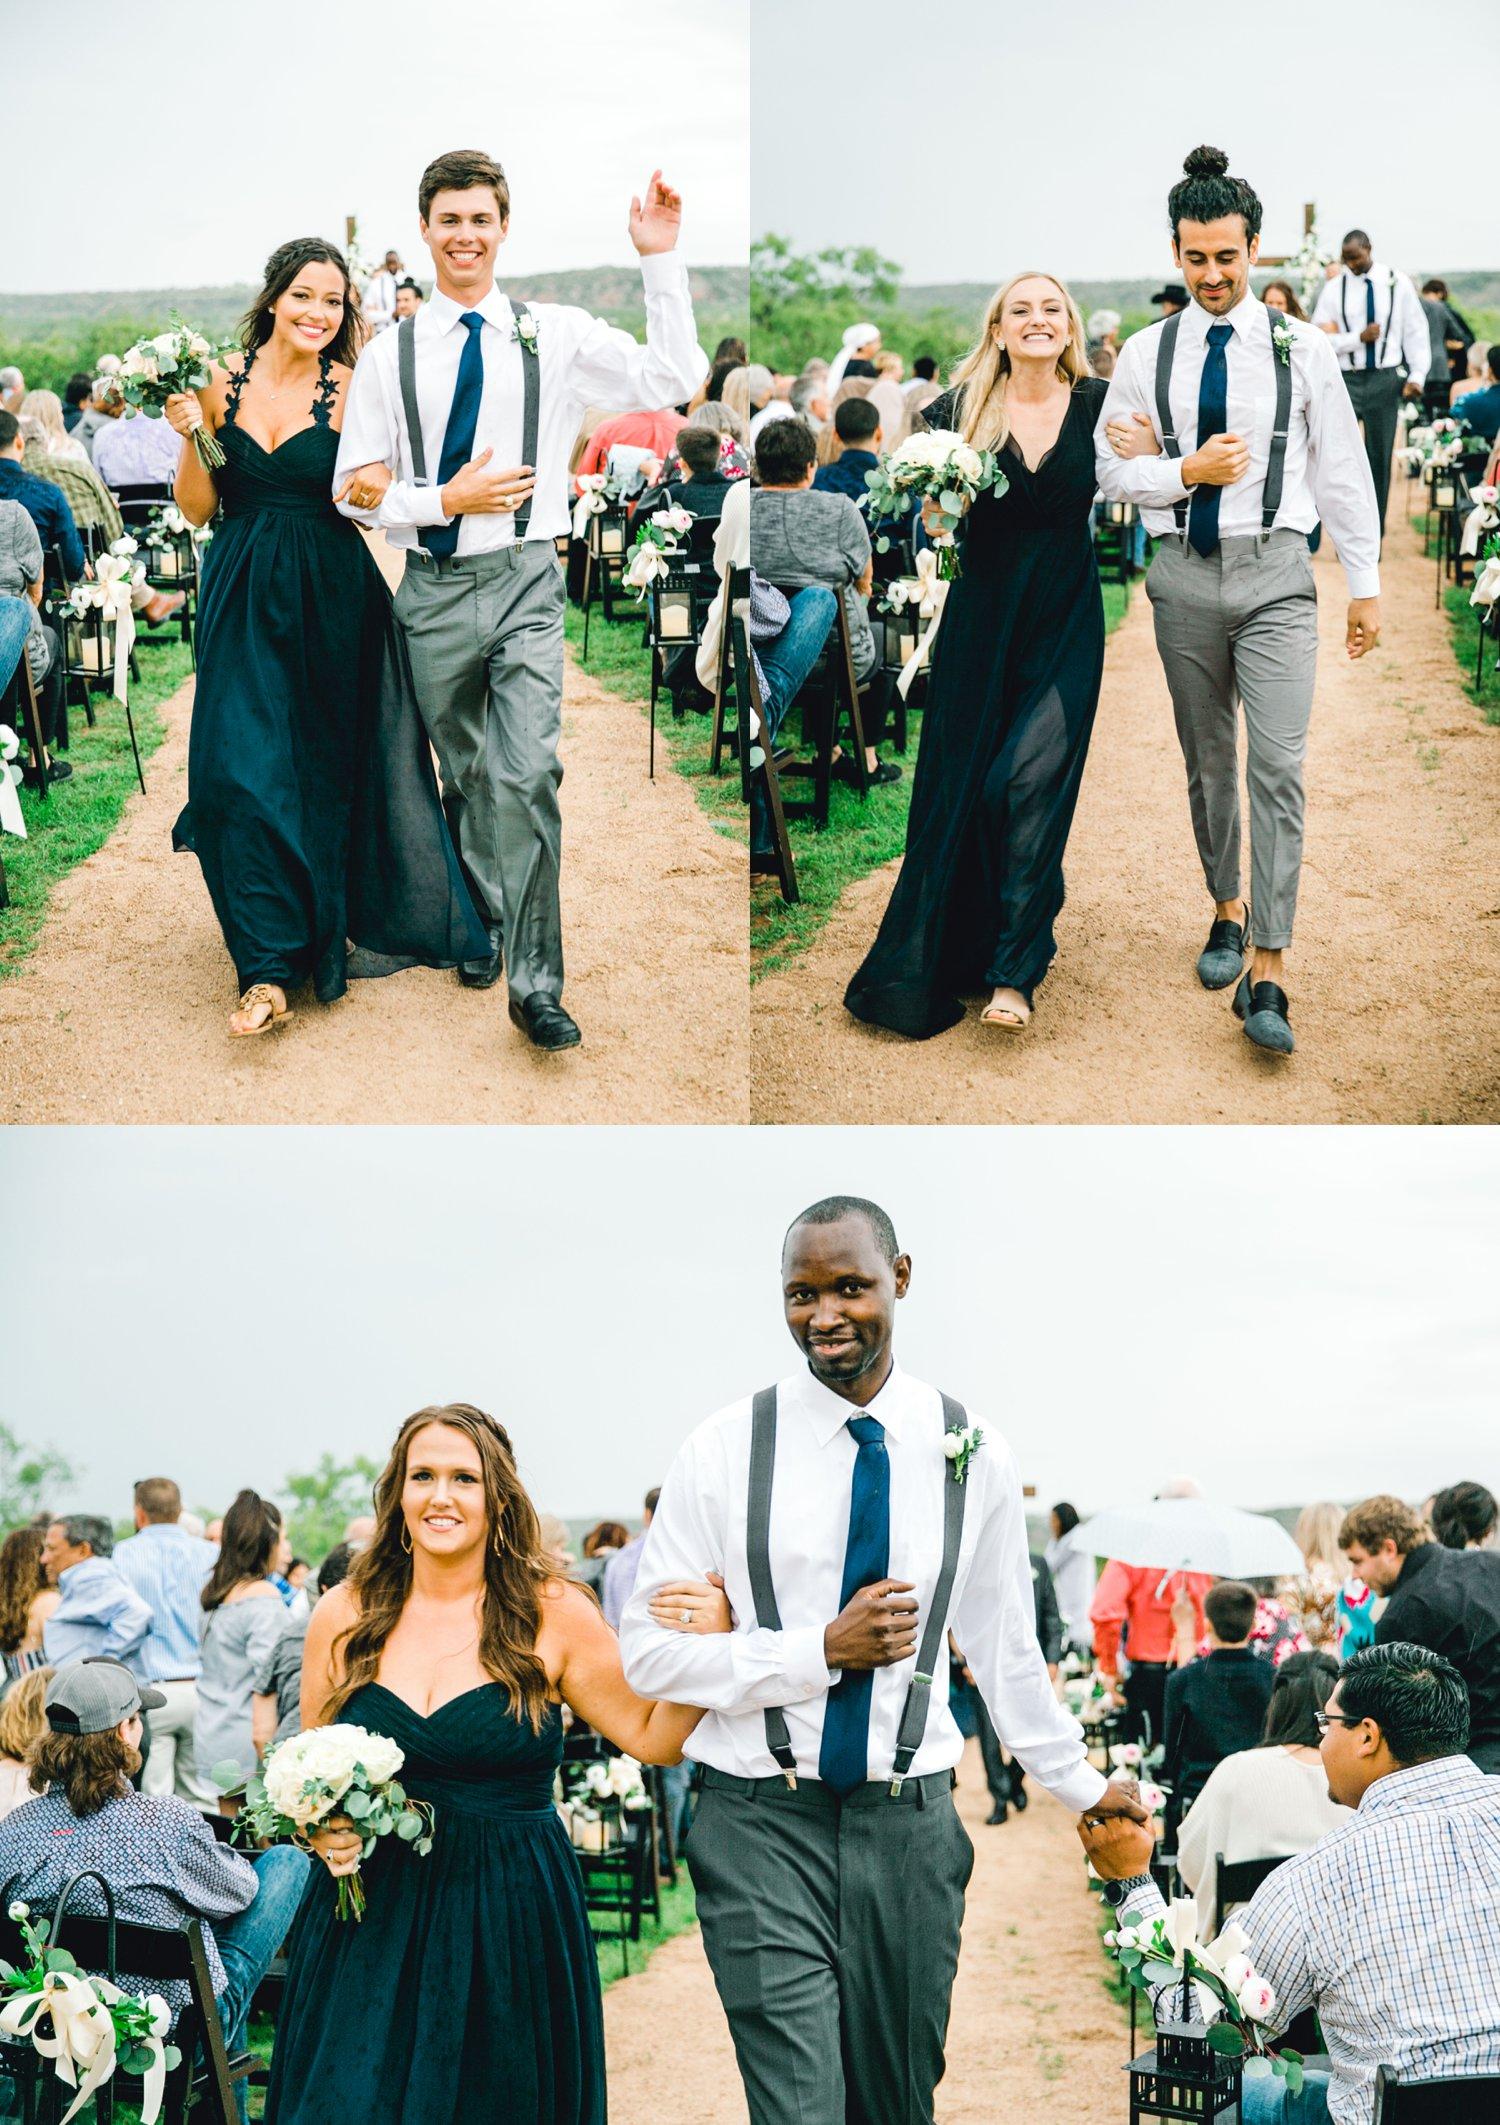 Ashley_John_English_Elegant_Texas_Wedding_Outdoors_Ranch_Caprock_Winery_ALLEEJ_0150.jpg